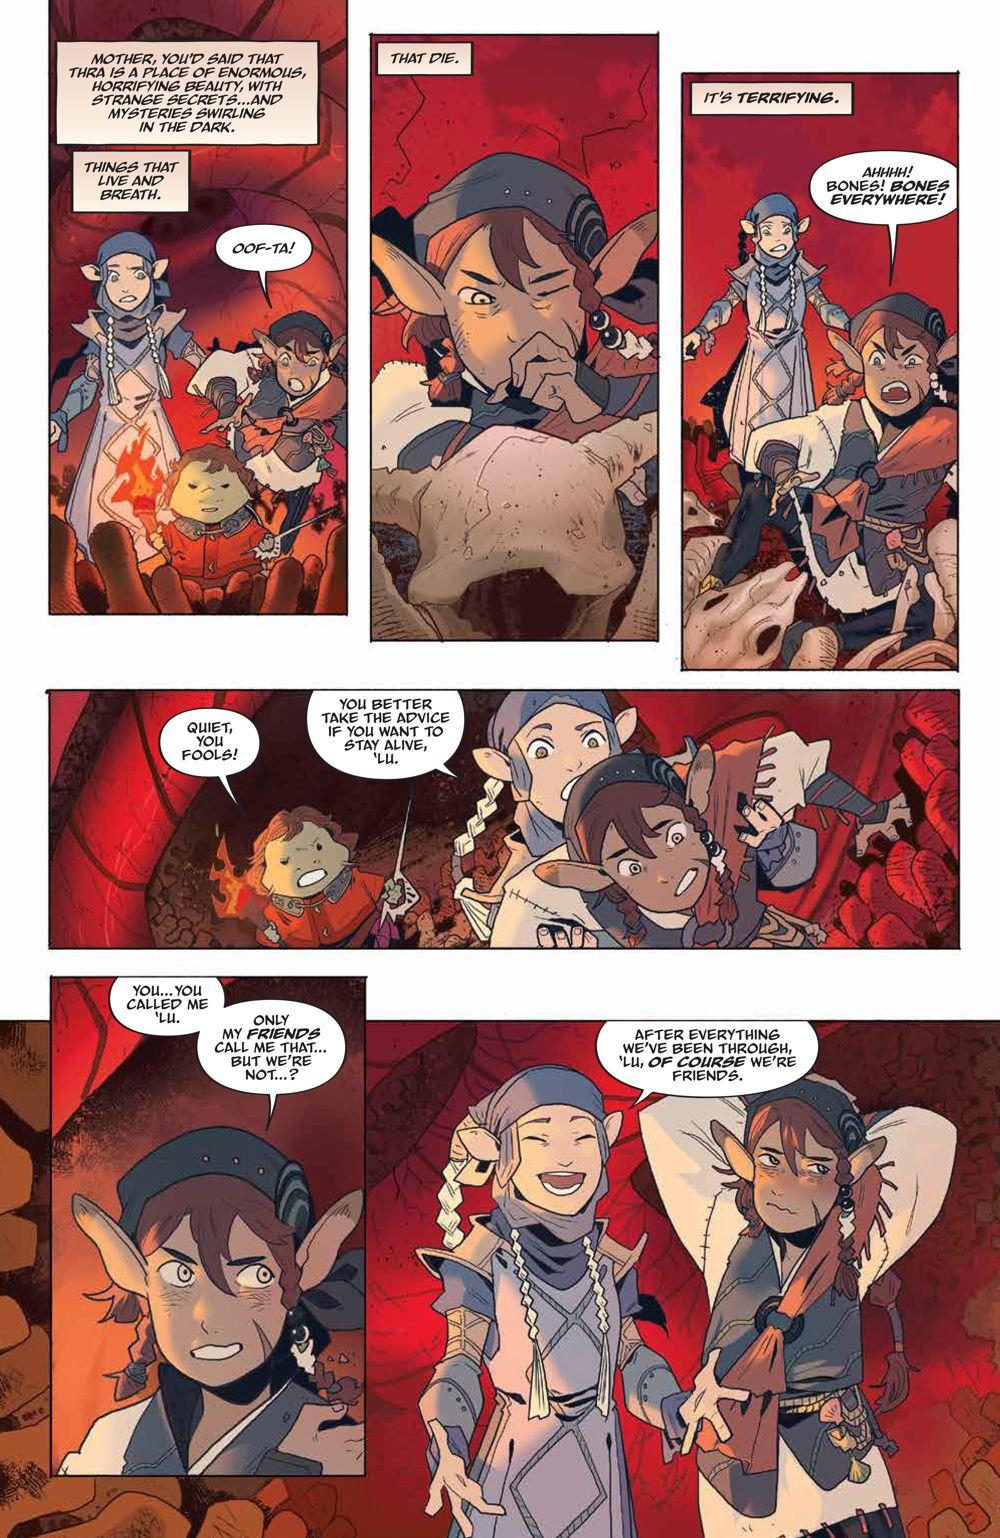 DarkCrystal_AgeResistance_011_PRESS_6 ComicList Previews: JIM HENSON'S THE DARK CRYSTAL AGE OF RESISTANCE #11